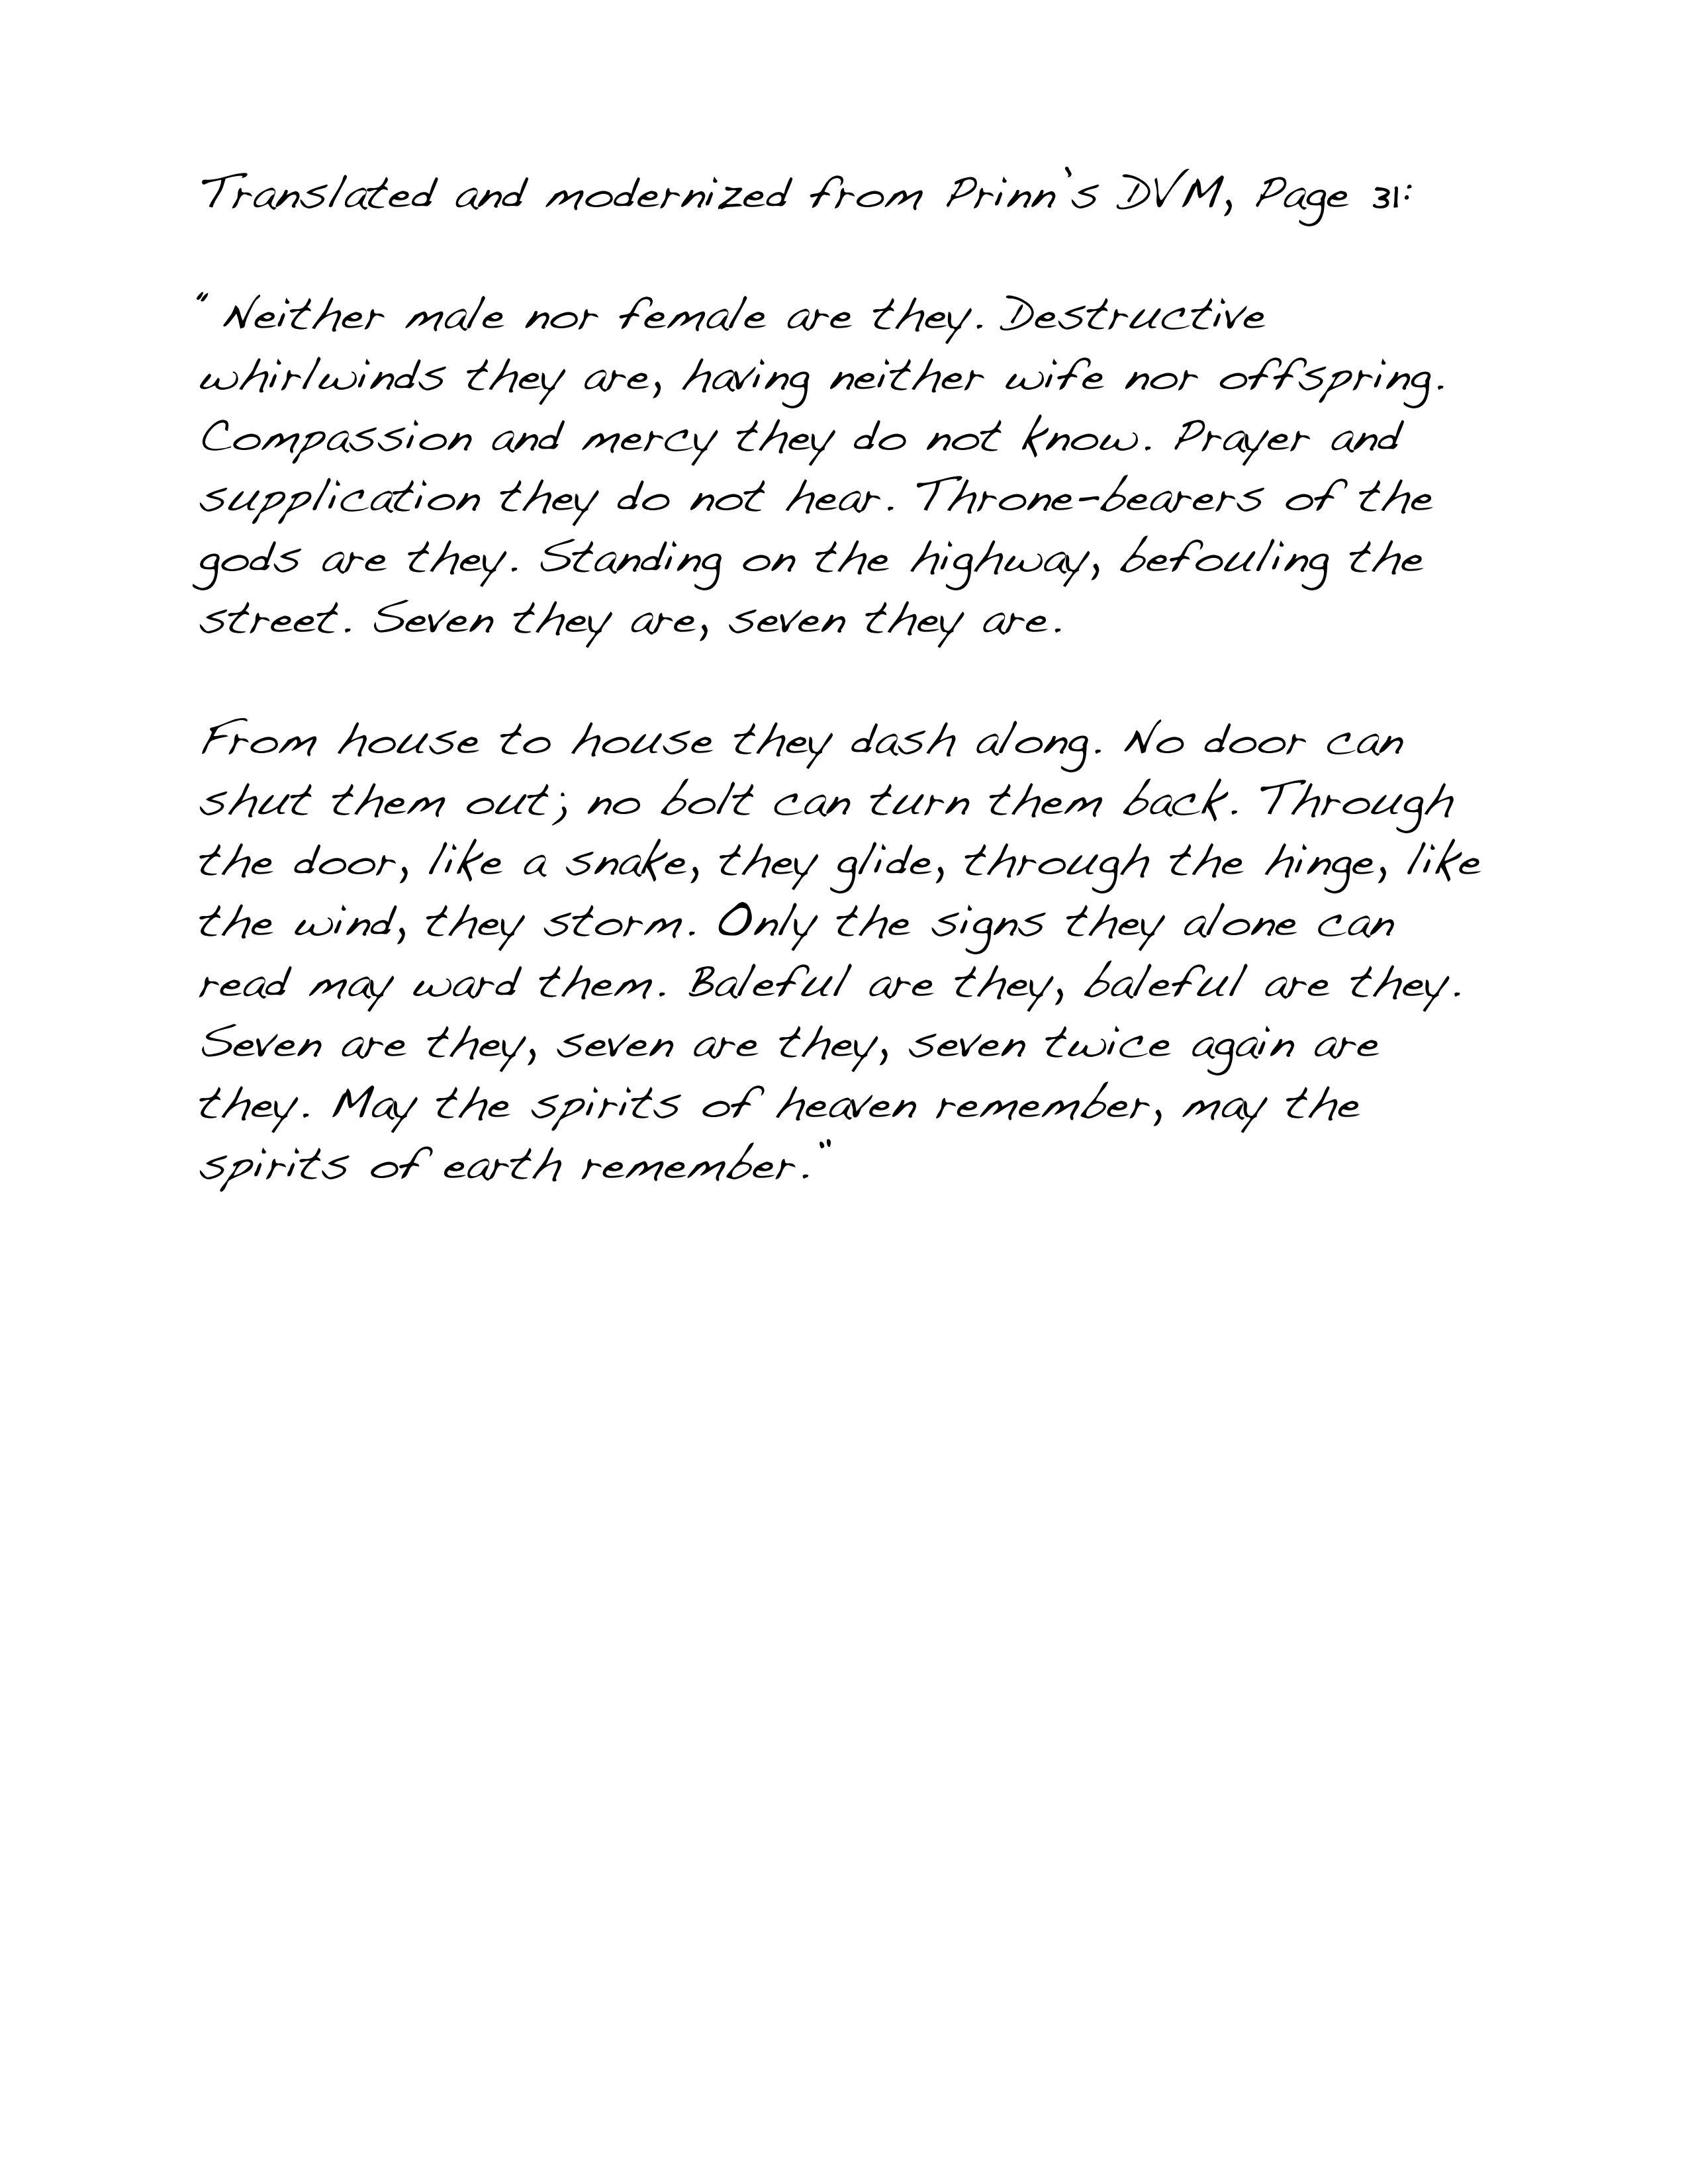 De vermis mysteriis page 2